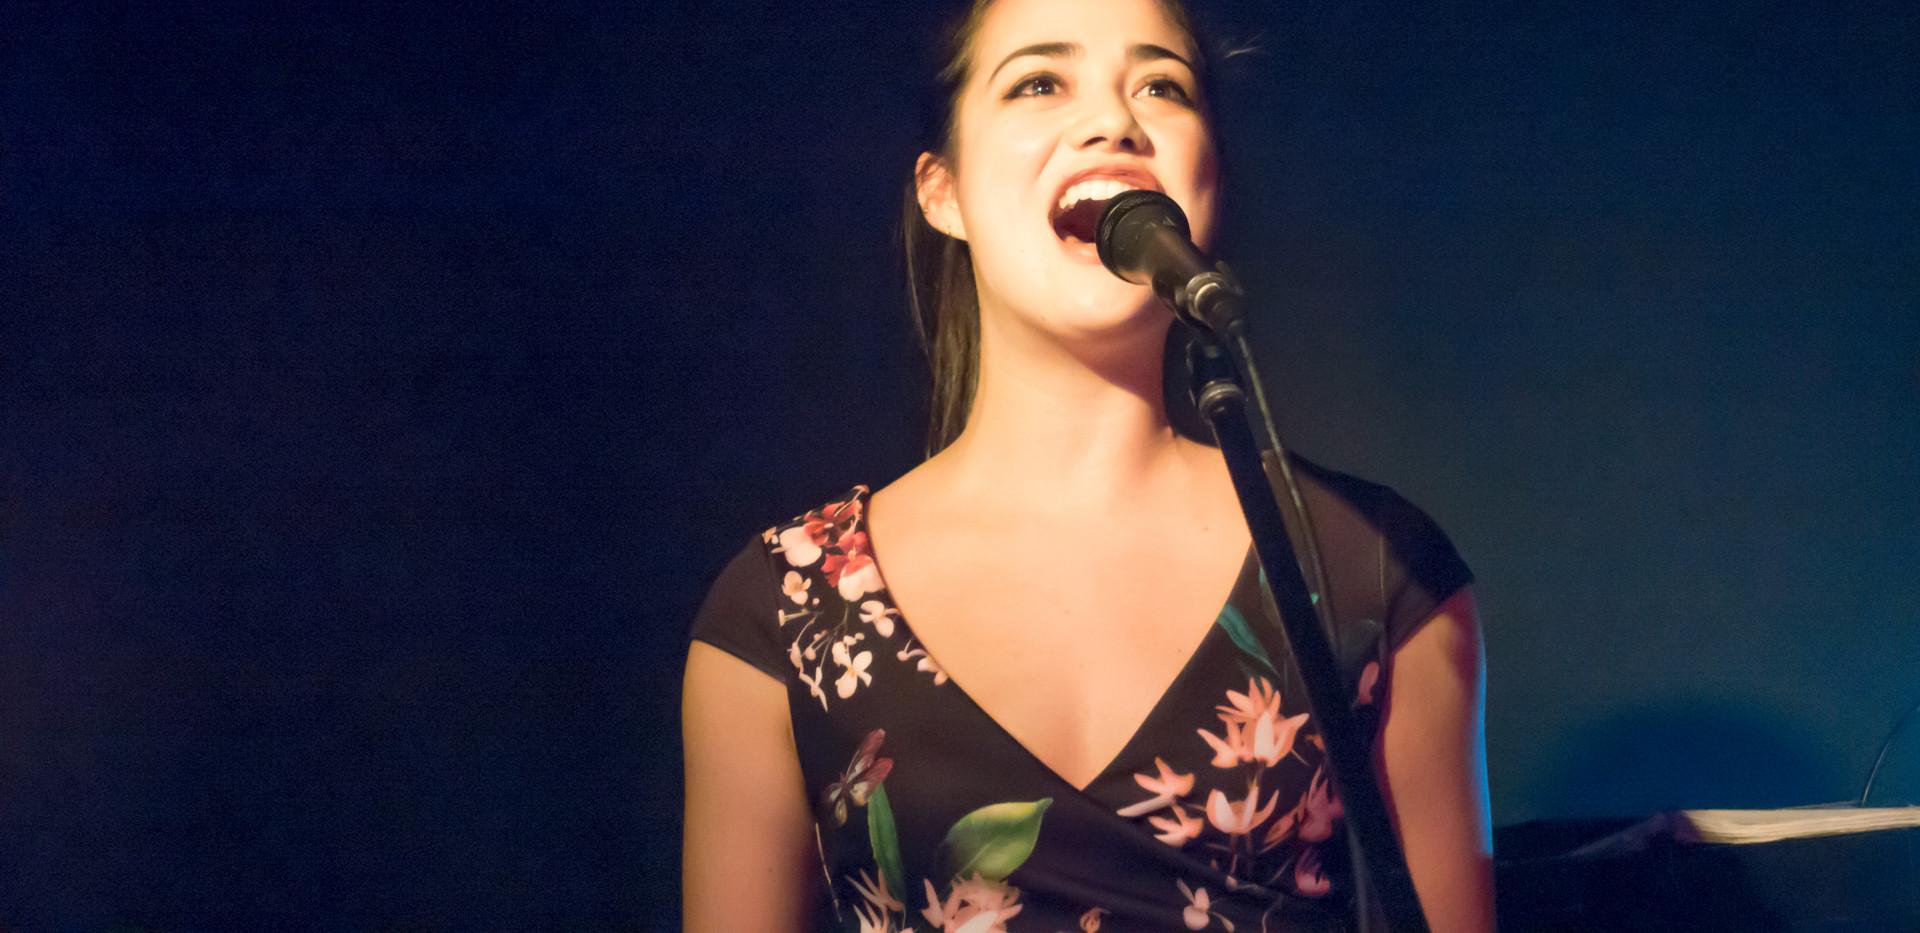 Miiya Alexander